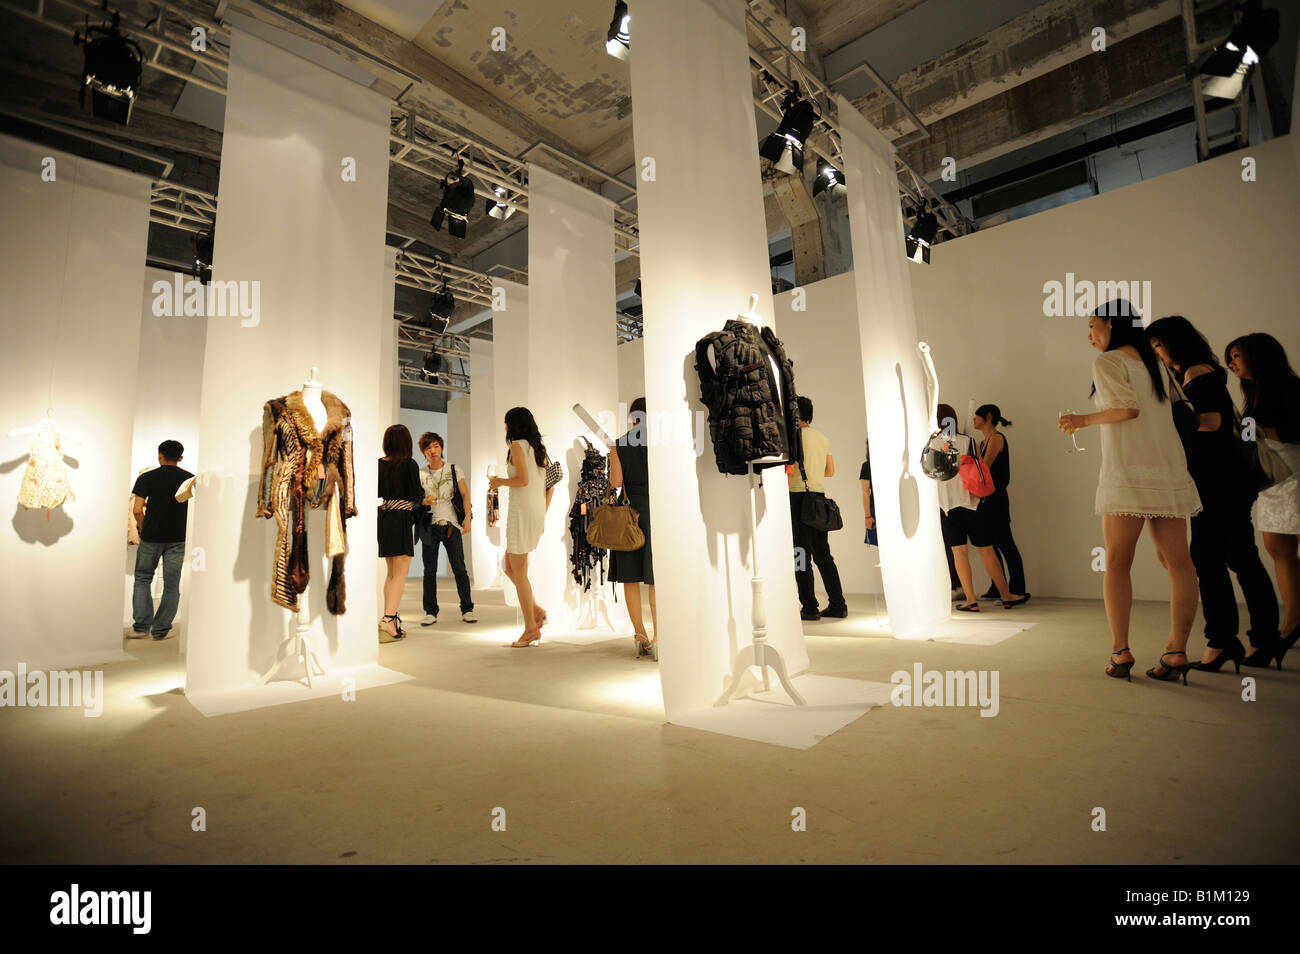 Exhibition Shell Zone : Maison martin margiela exhibition at art zone in